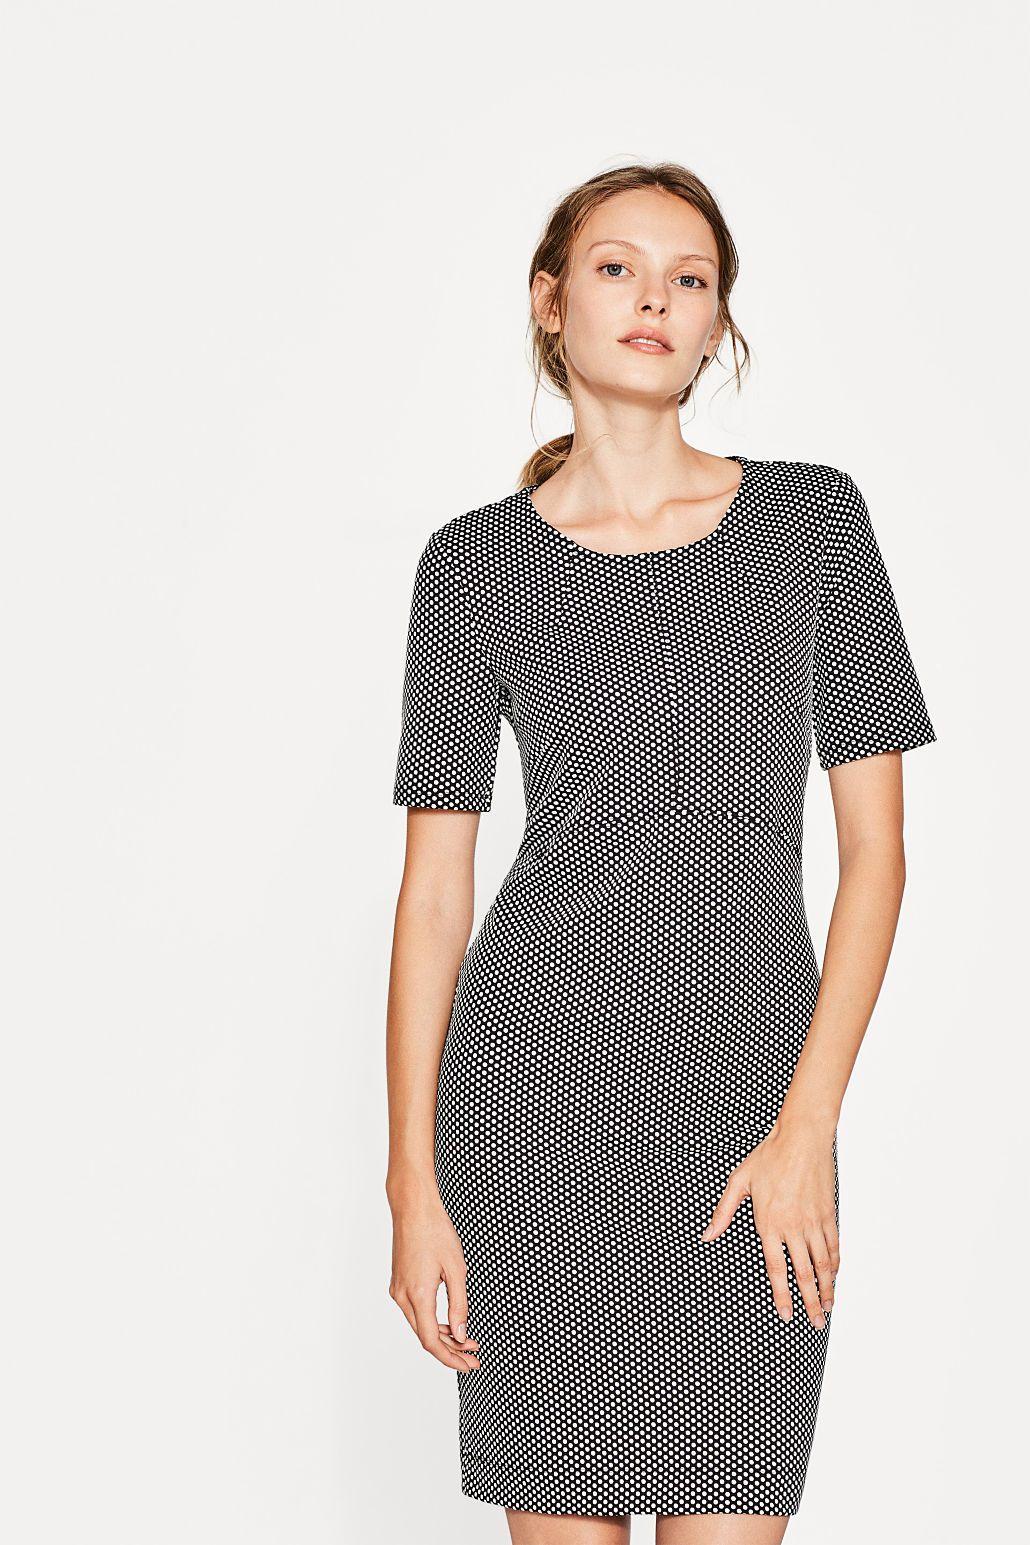 20decdeeb44 Esprit - Smal kjole med prikker, jersey/stretch | AW 18/19 QR ...